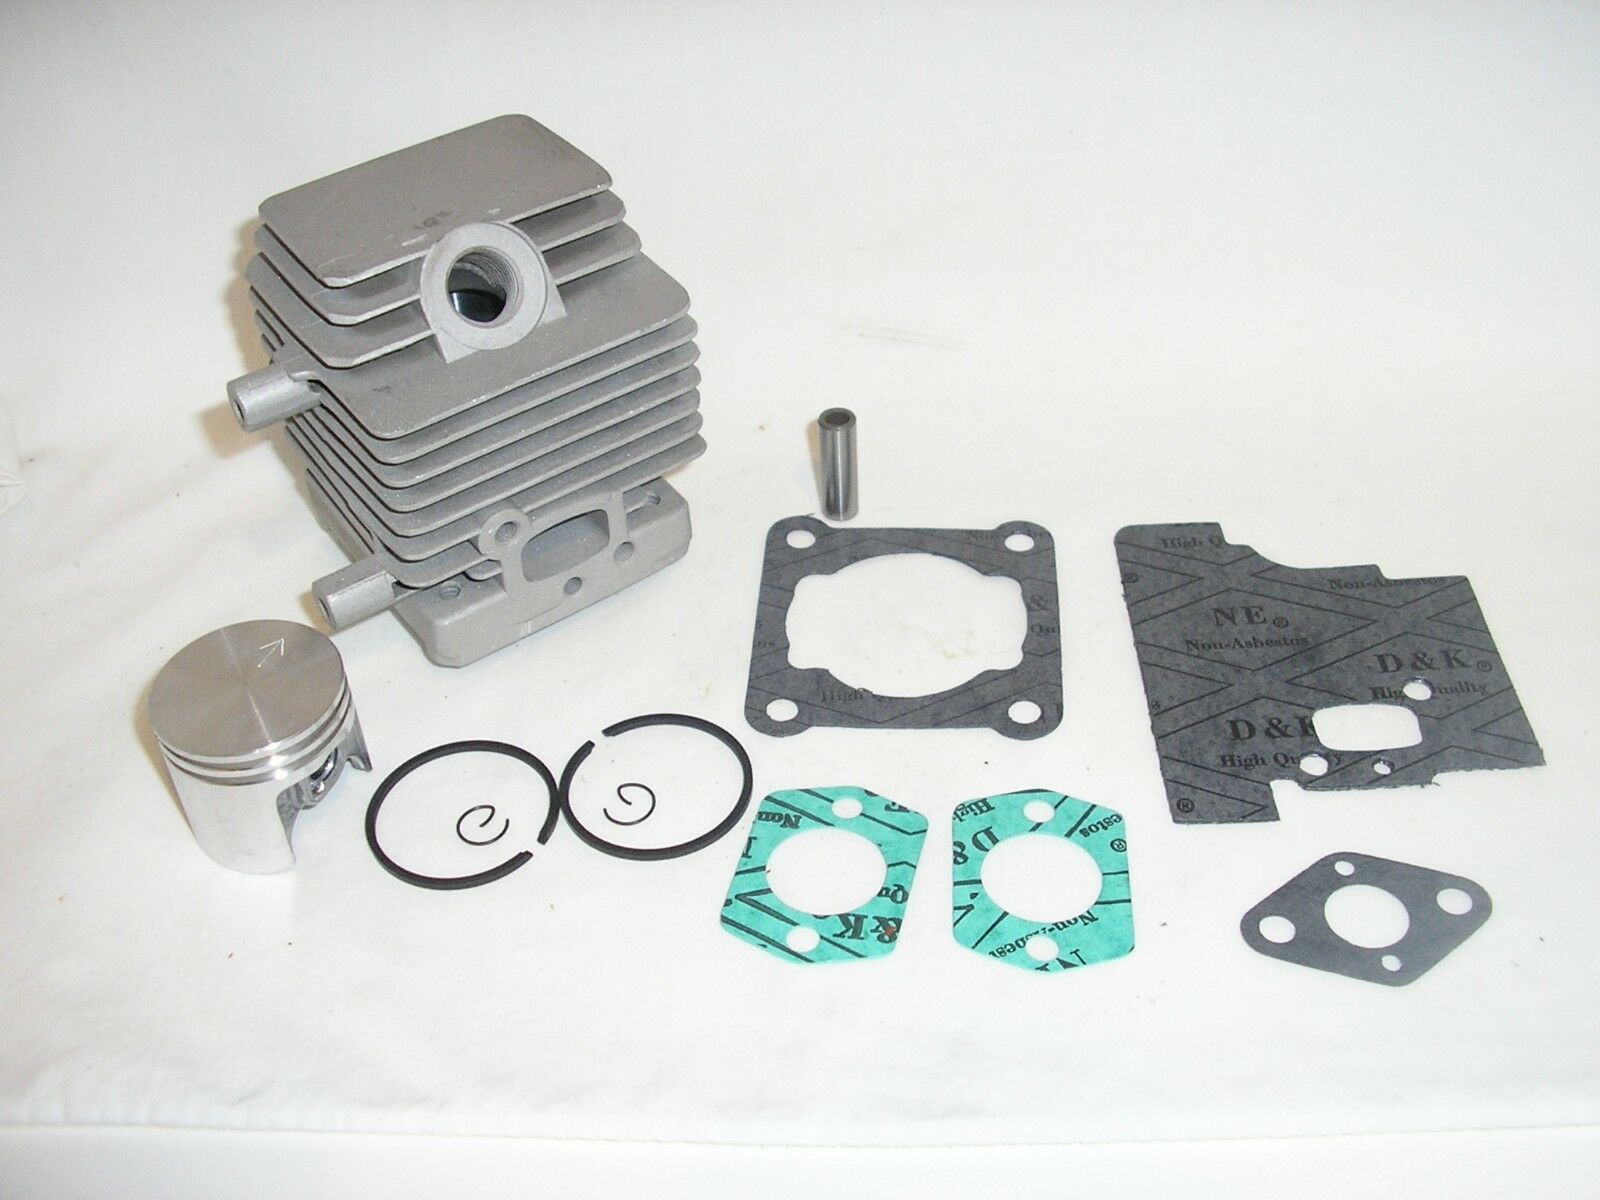 STIHL FS85, FS80, FS75 REPLACEMENT PISTON & CYLINDER & GASKETS FOR STIHL TRIMMER